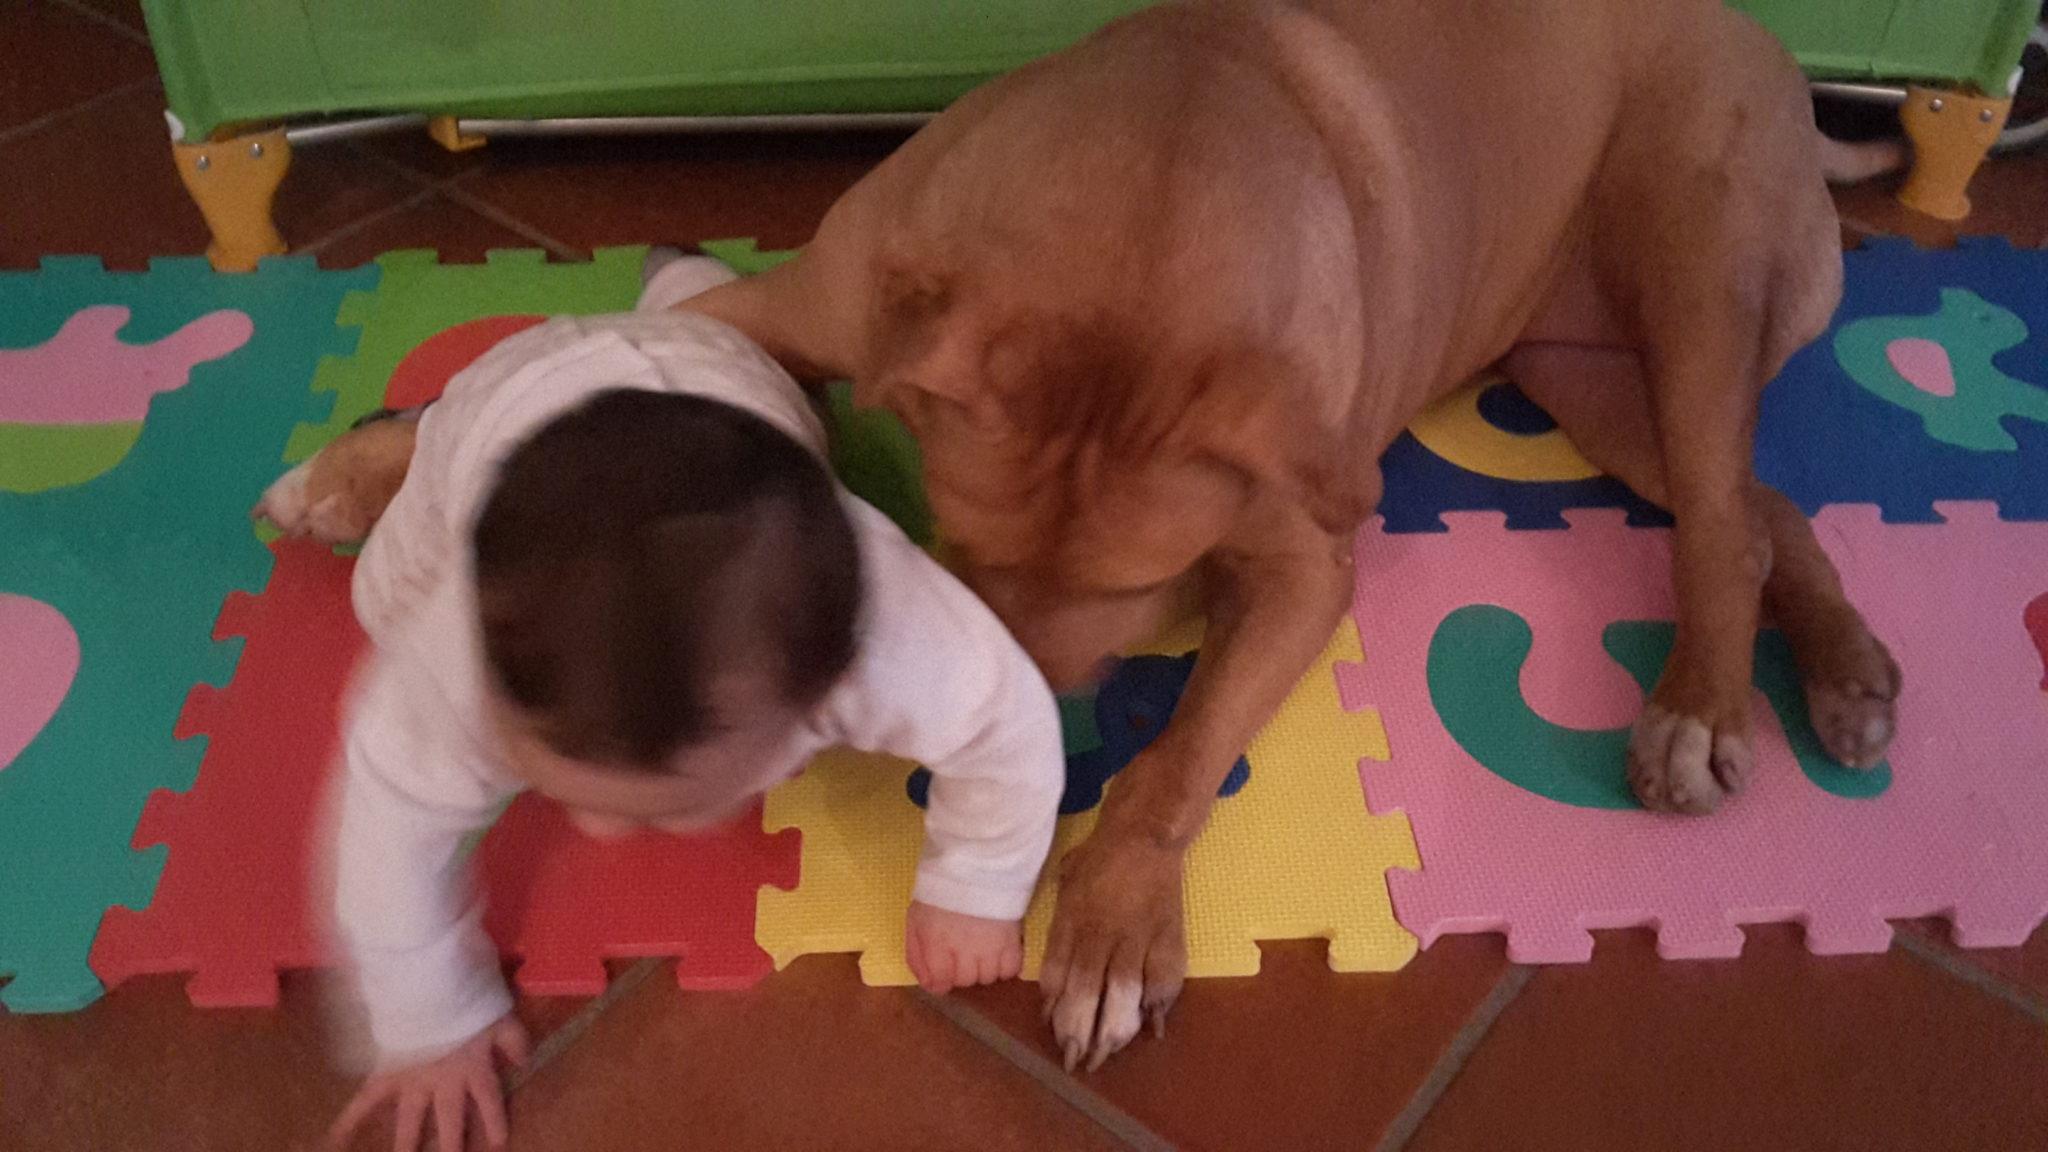 Cane e bambino giocano